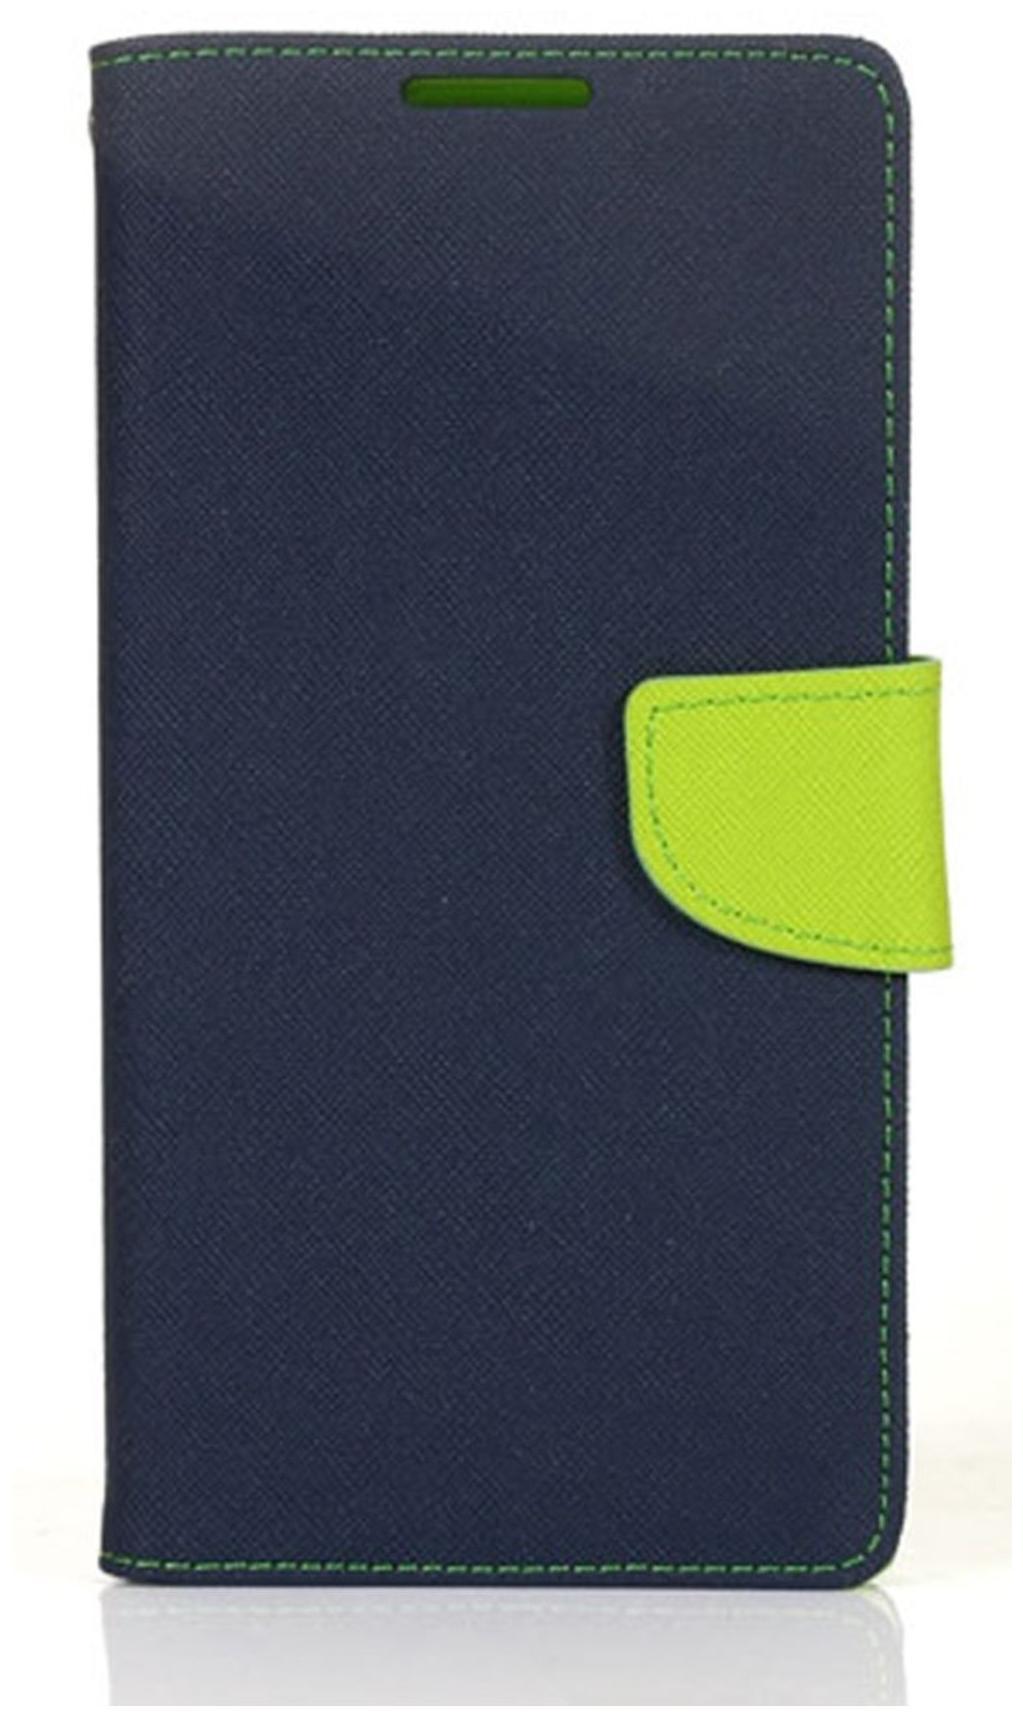 SCHOFIC Wallet Diary Flip Cover for VIVO Y31 / Y31L   NAVY BLUE by Schofic